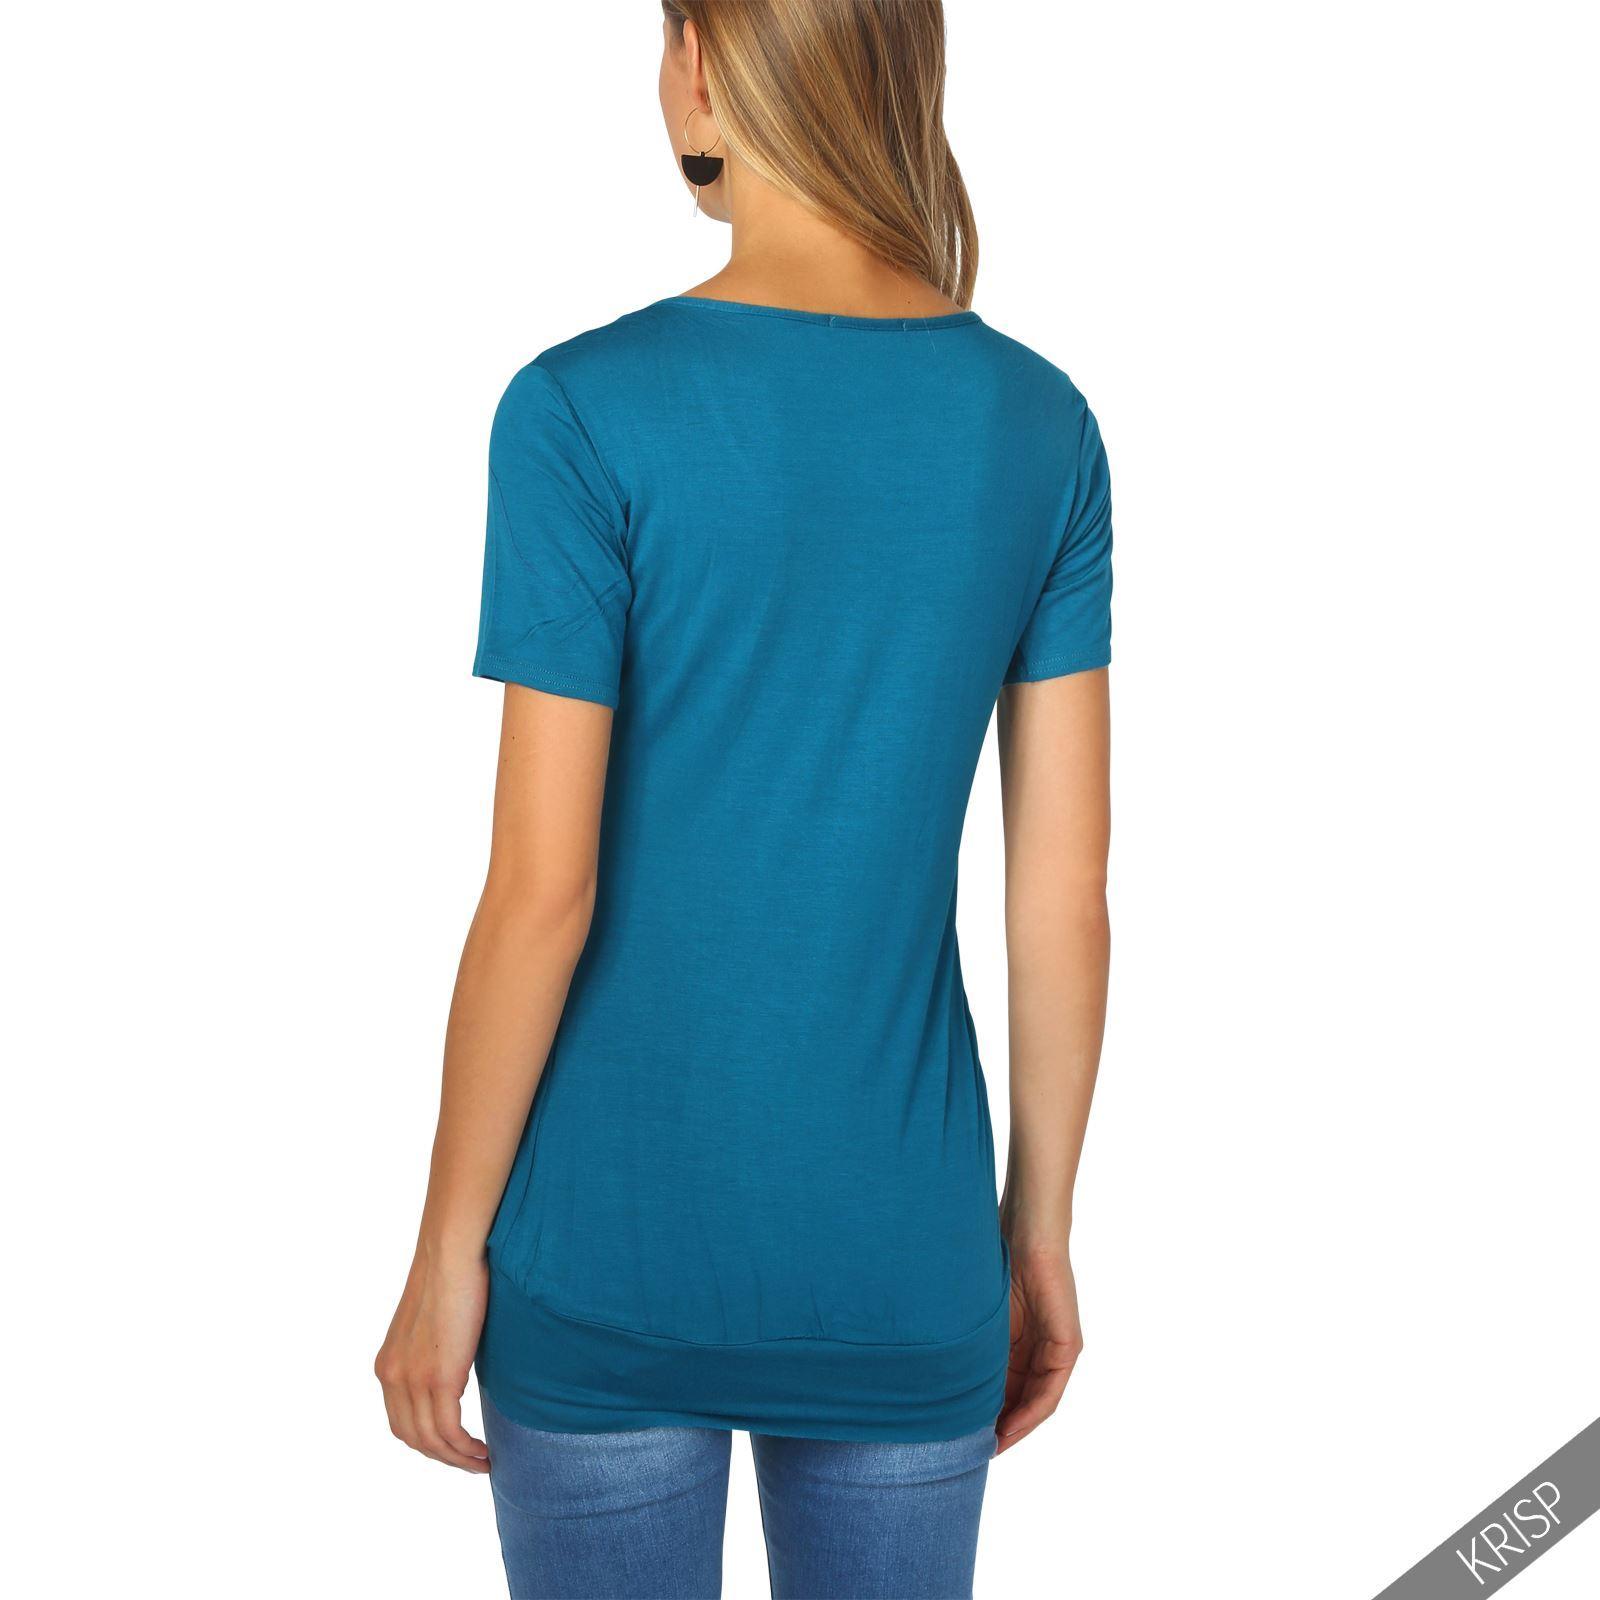 Womens-Ladies-Pleated-T-Shirt-Long-Blouse-Loose-Jersey-Top-Plain-Tunic-Plus-8-20 thumbnail 13